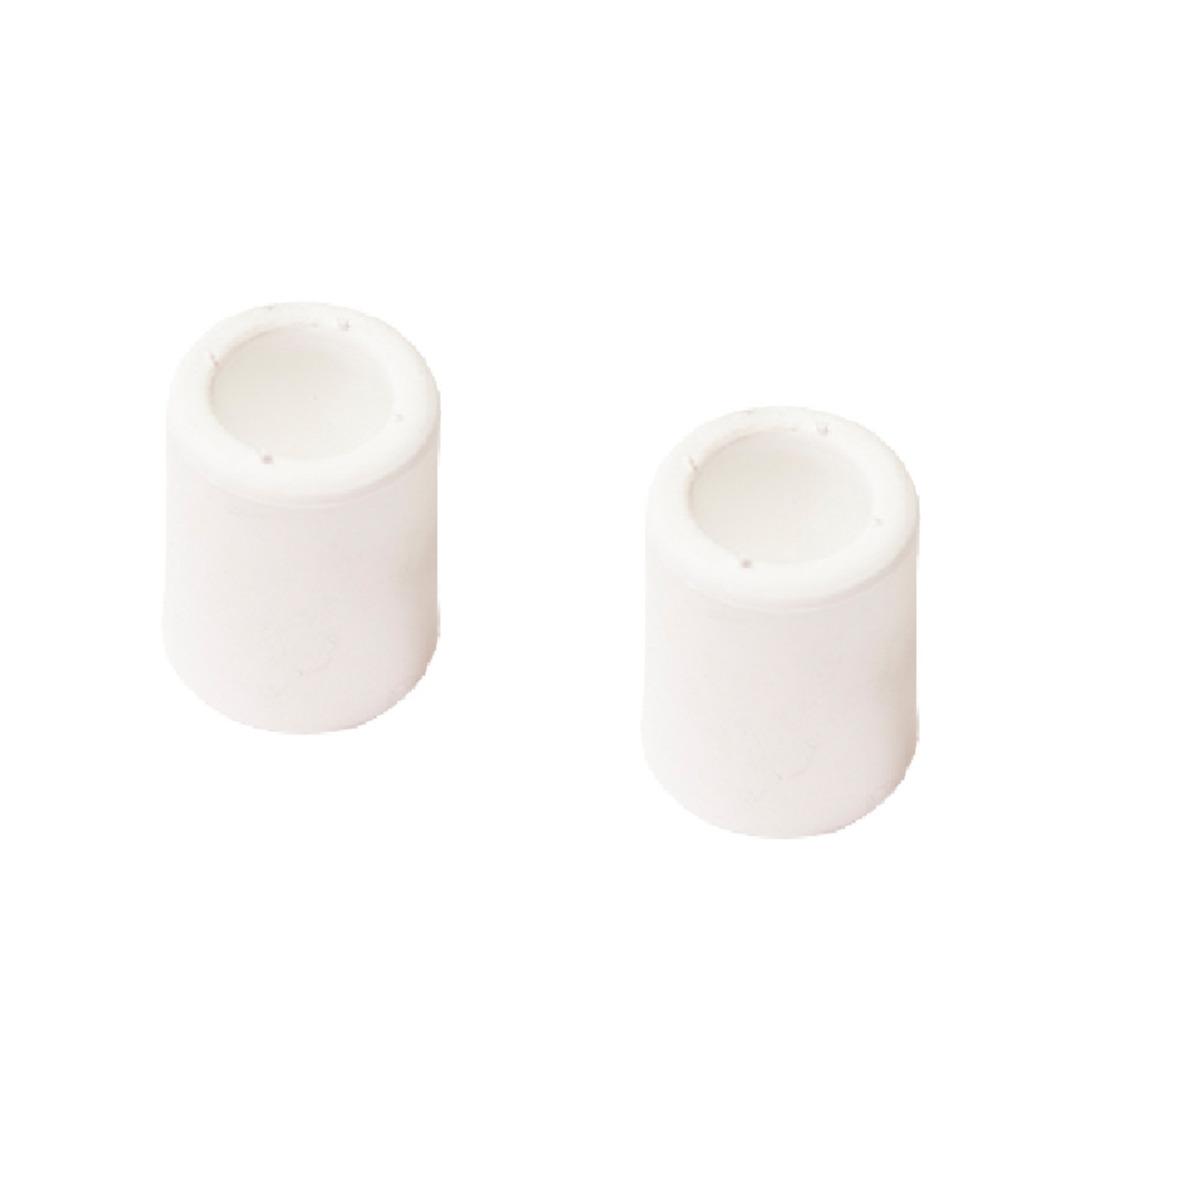 4x stuks deurstopper - deurbuffer rubber wit 60 mm